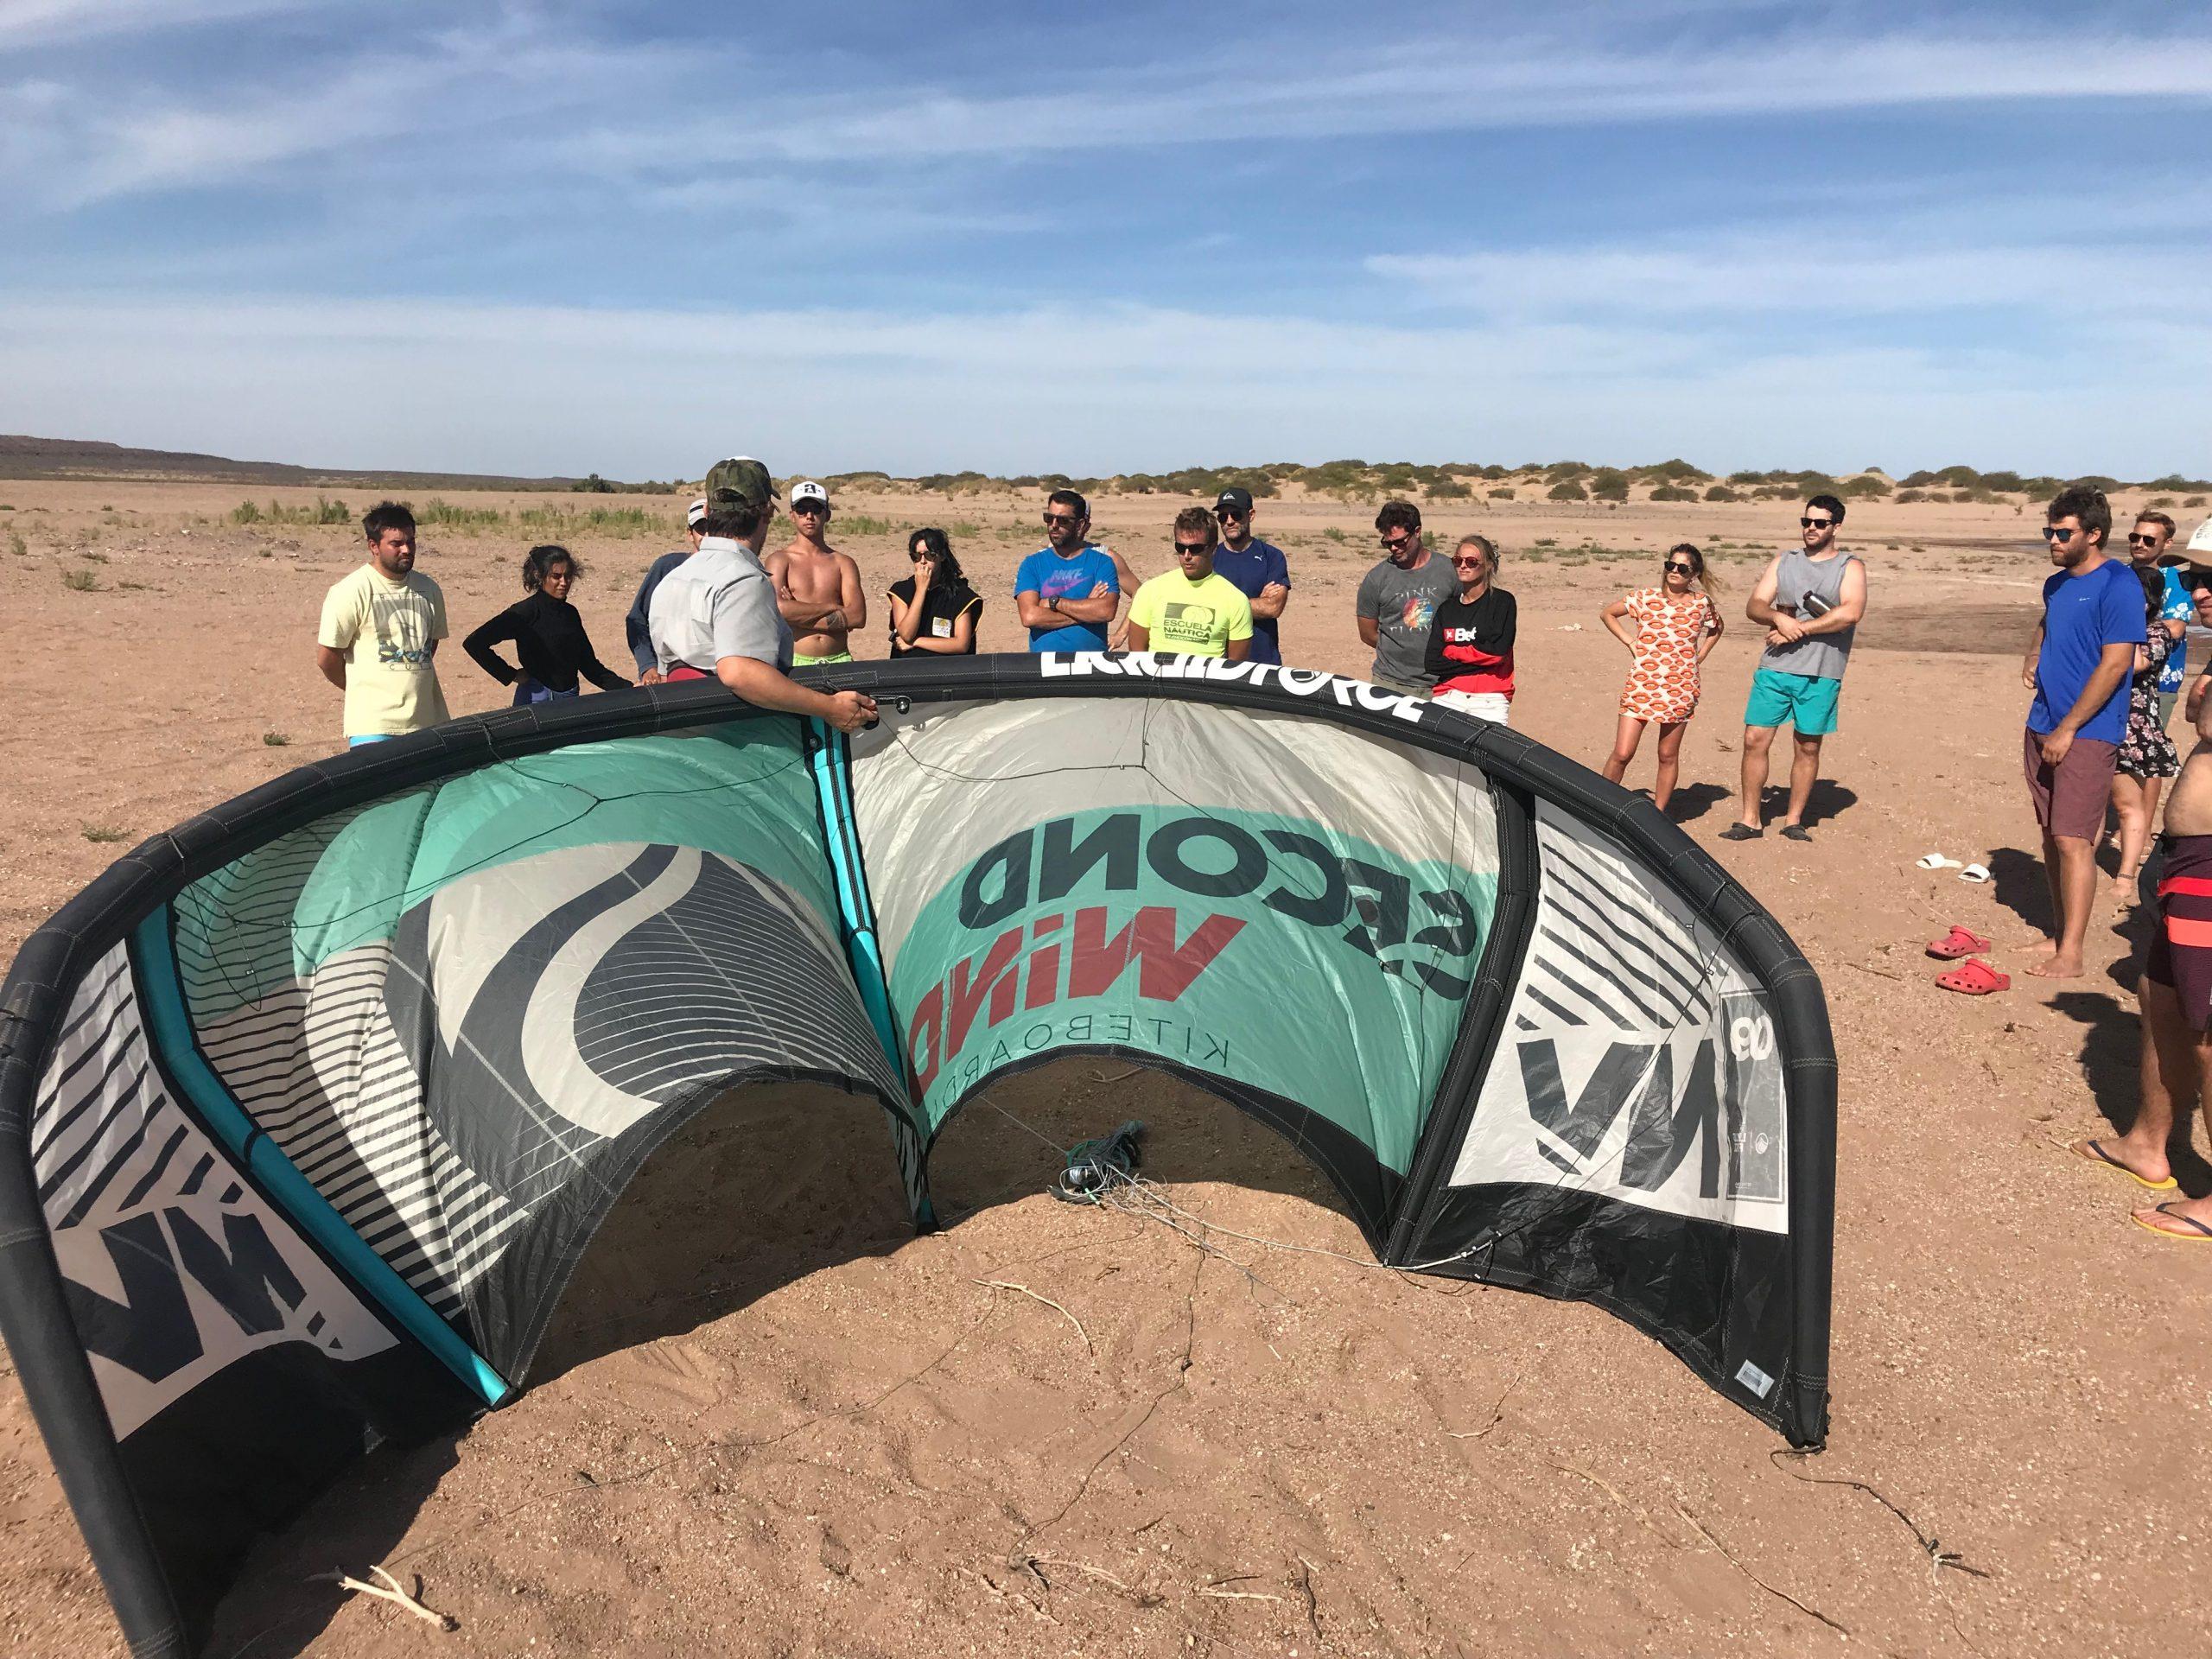 clases de kite kitesurf autorescate